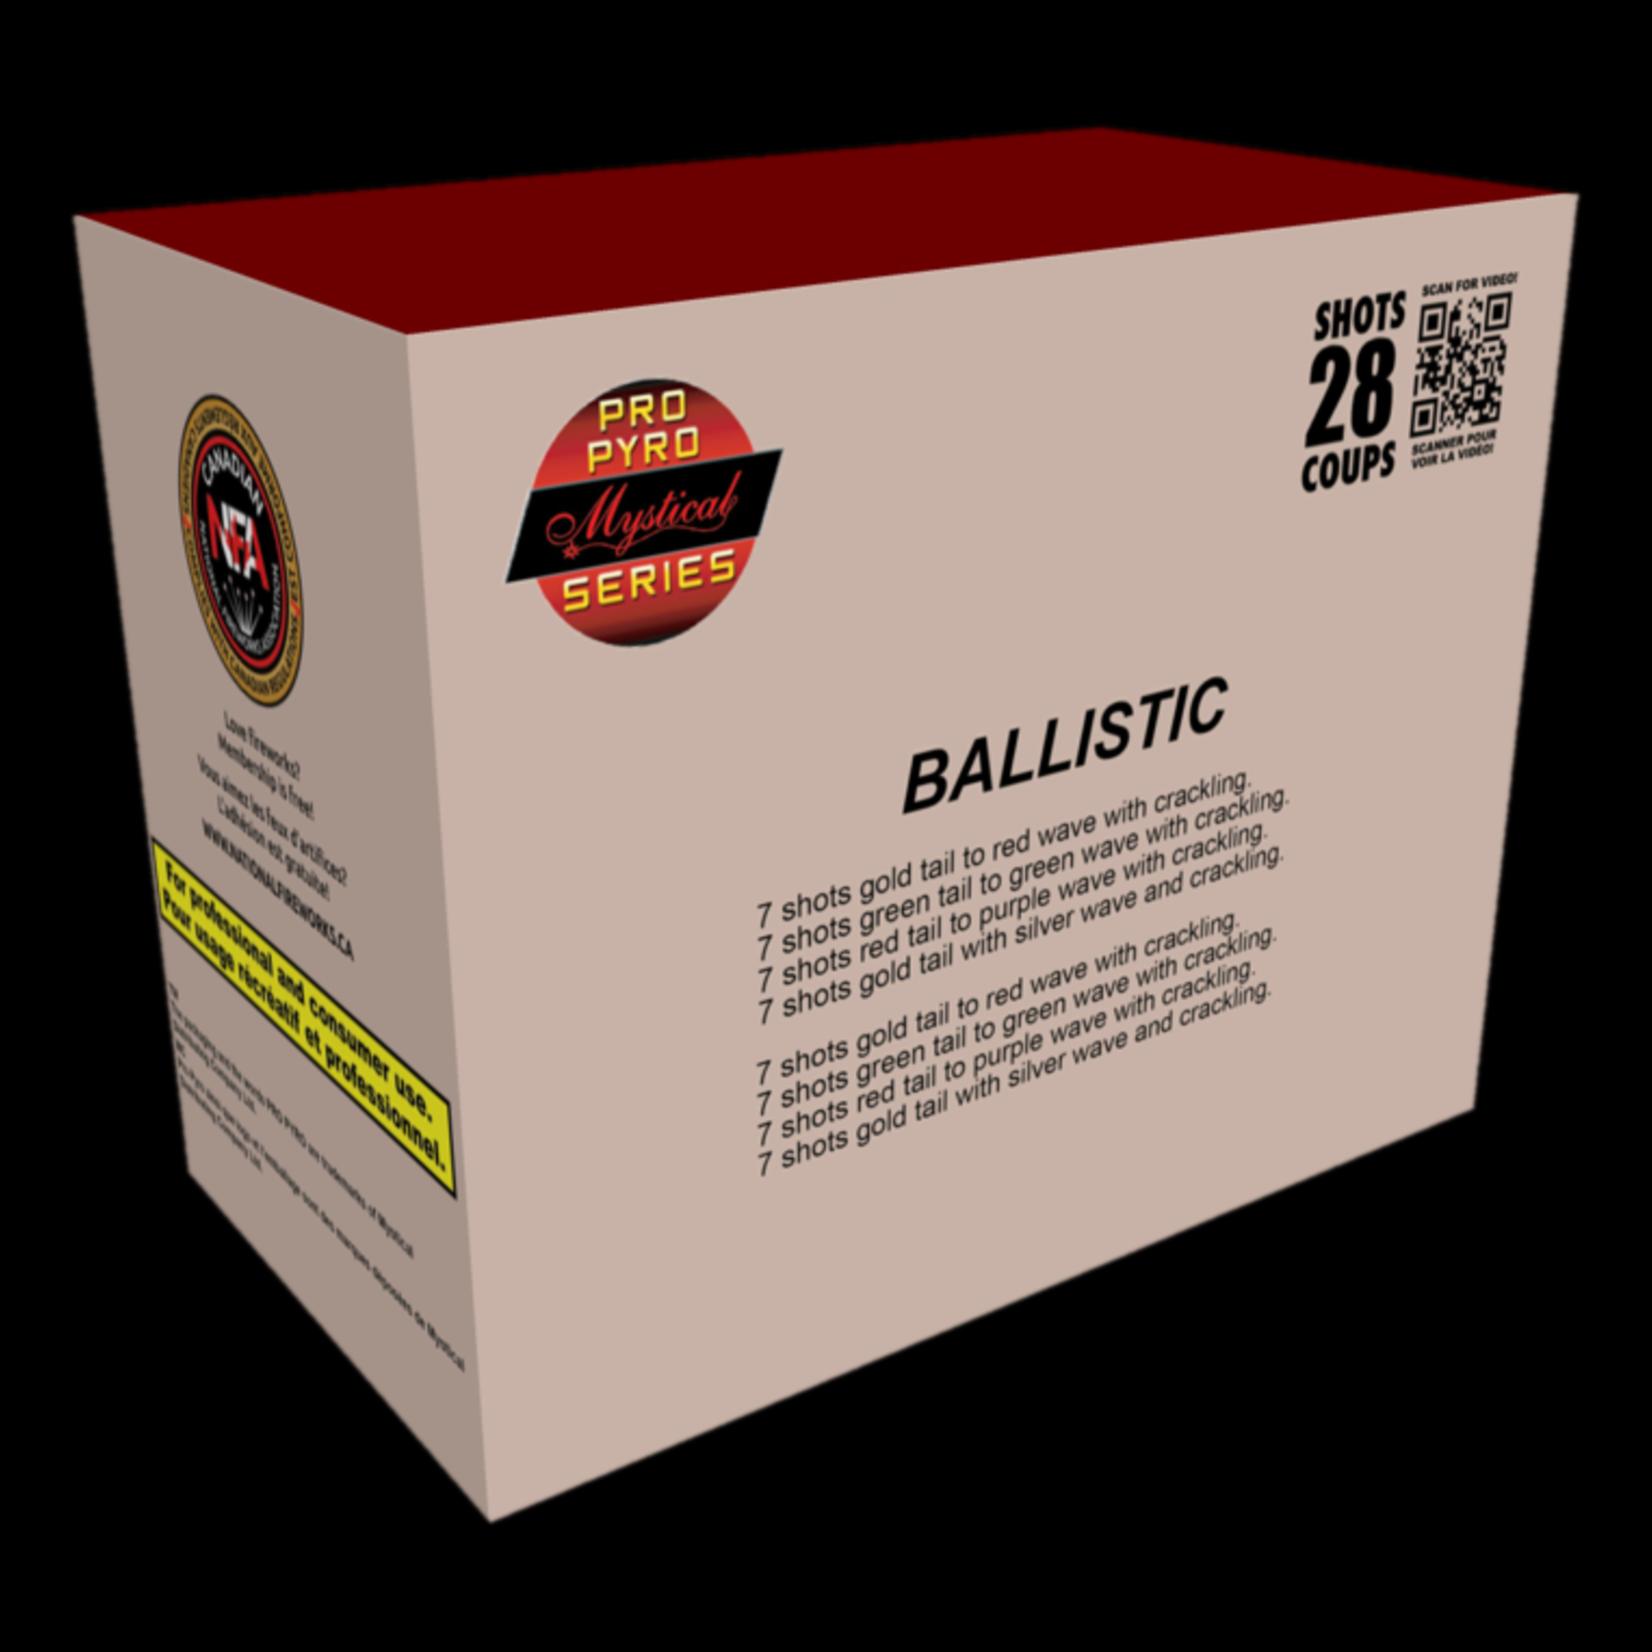 Ballisitc